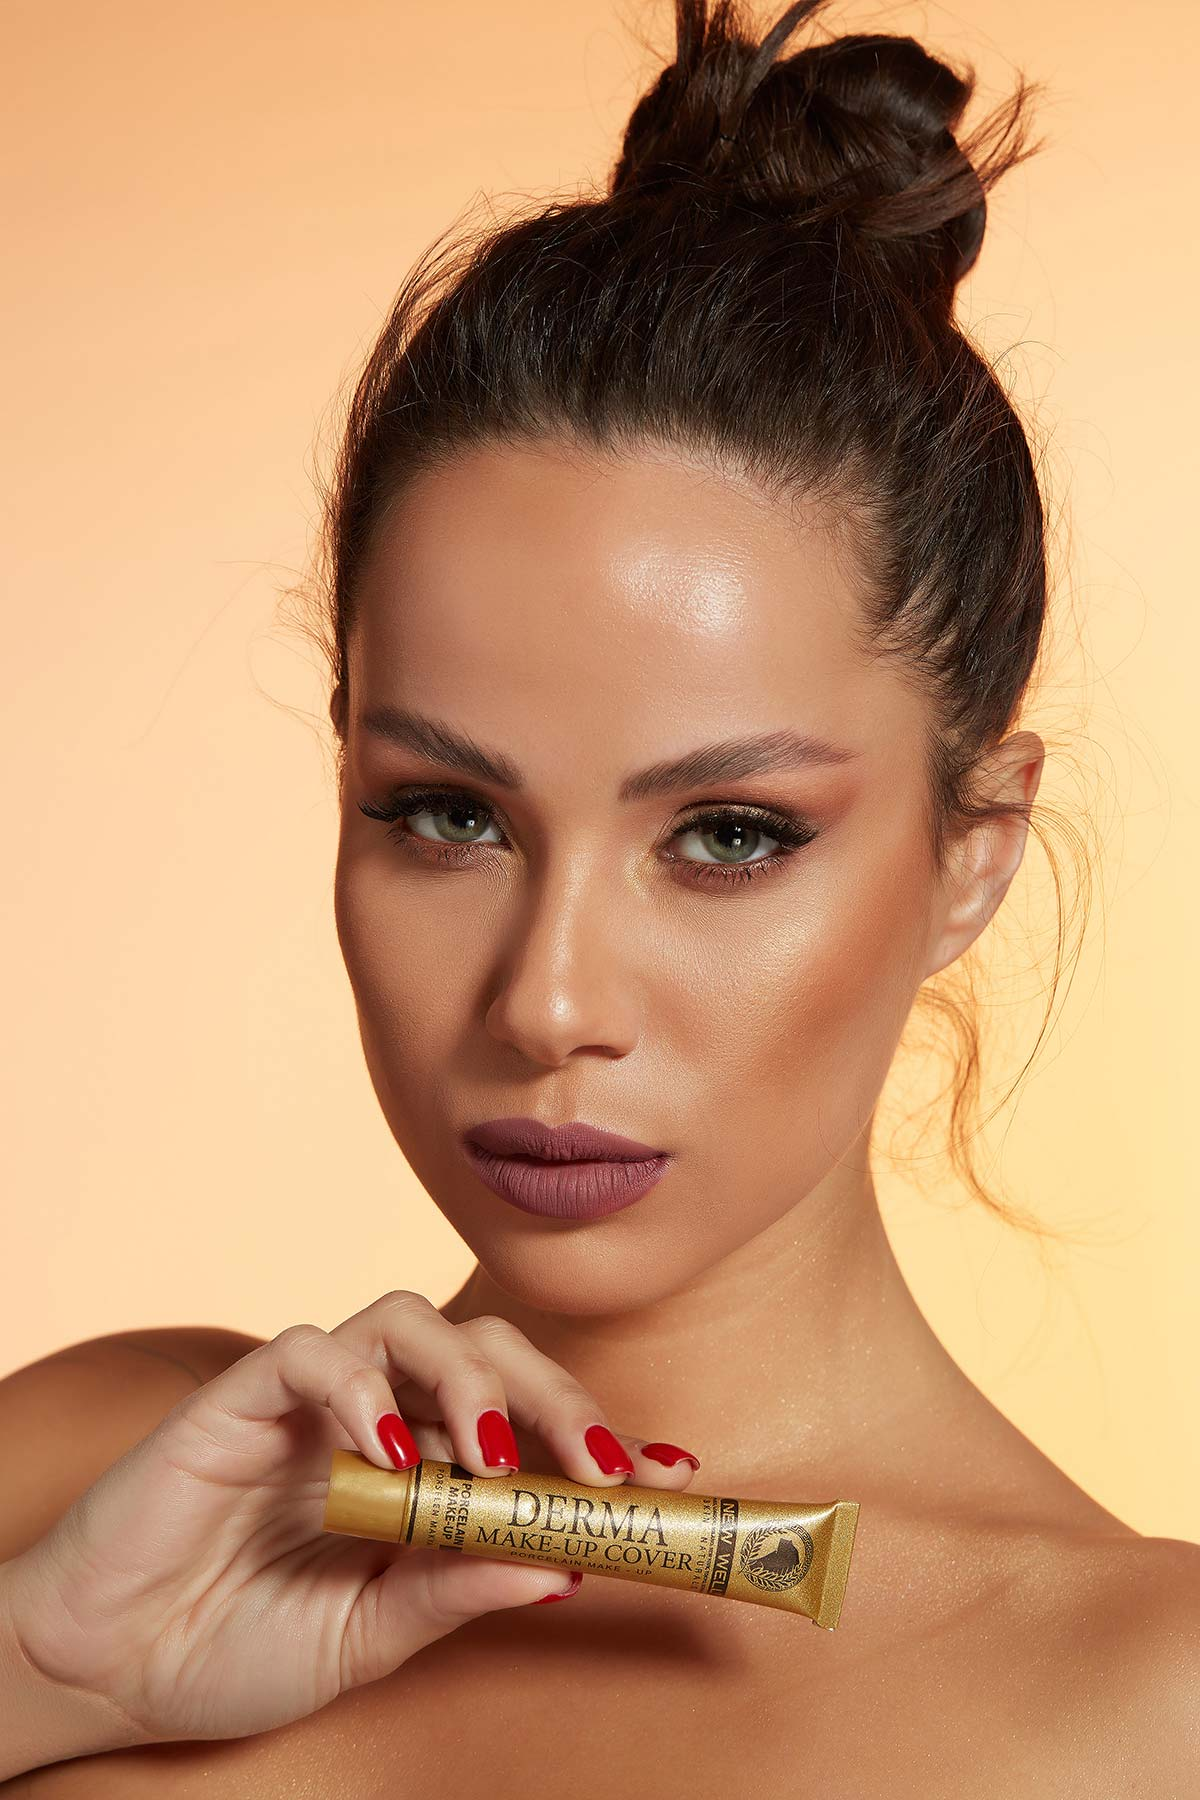 Derma Make-Up Cover Foundation - Silver -Fondöten - Foundation